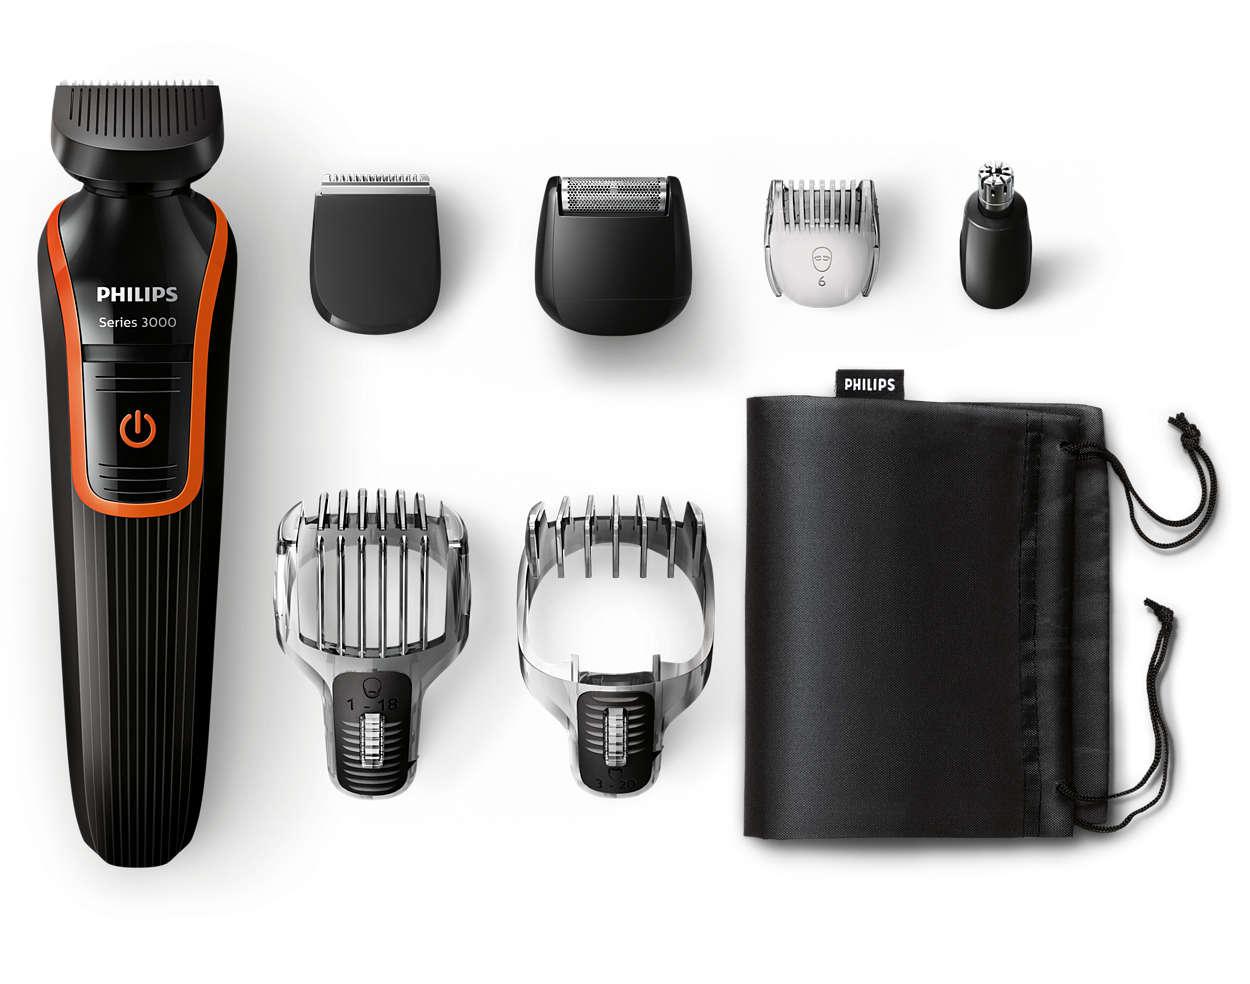 multigroom series 3000 tondeuse barbe et cheveux 7 en 1 qg3341 16 philips. Black Bedroom Furniture Sets. Home Design Ideas